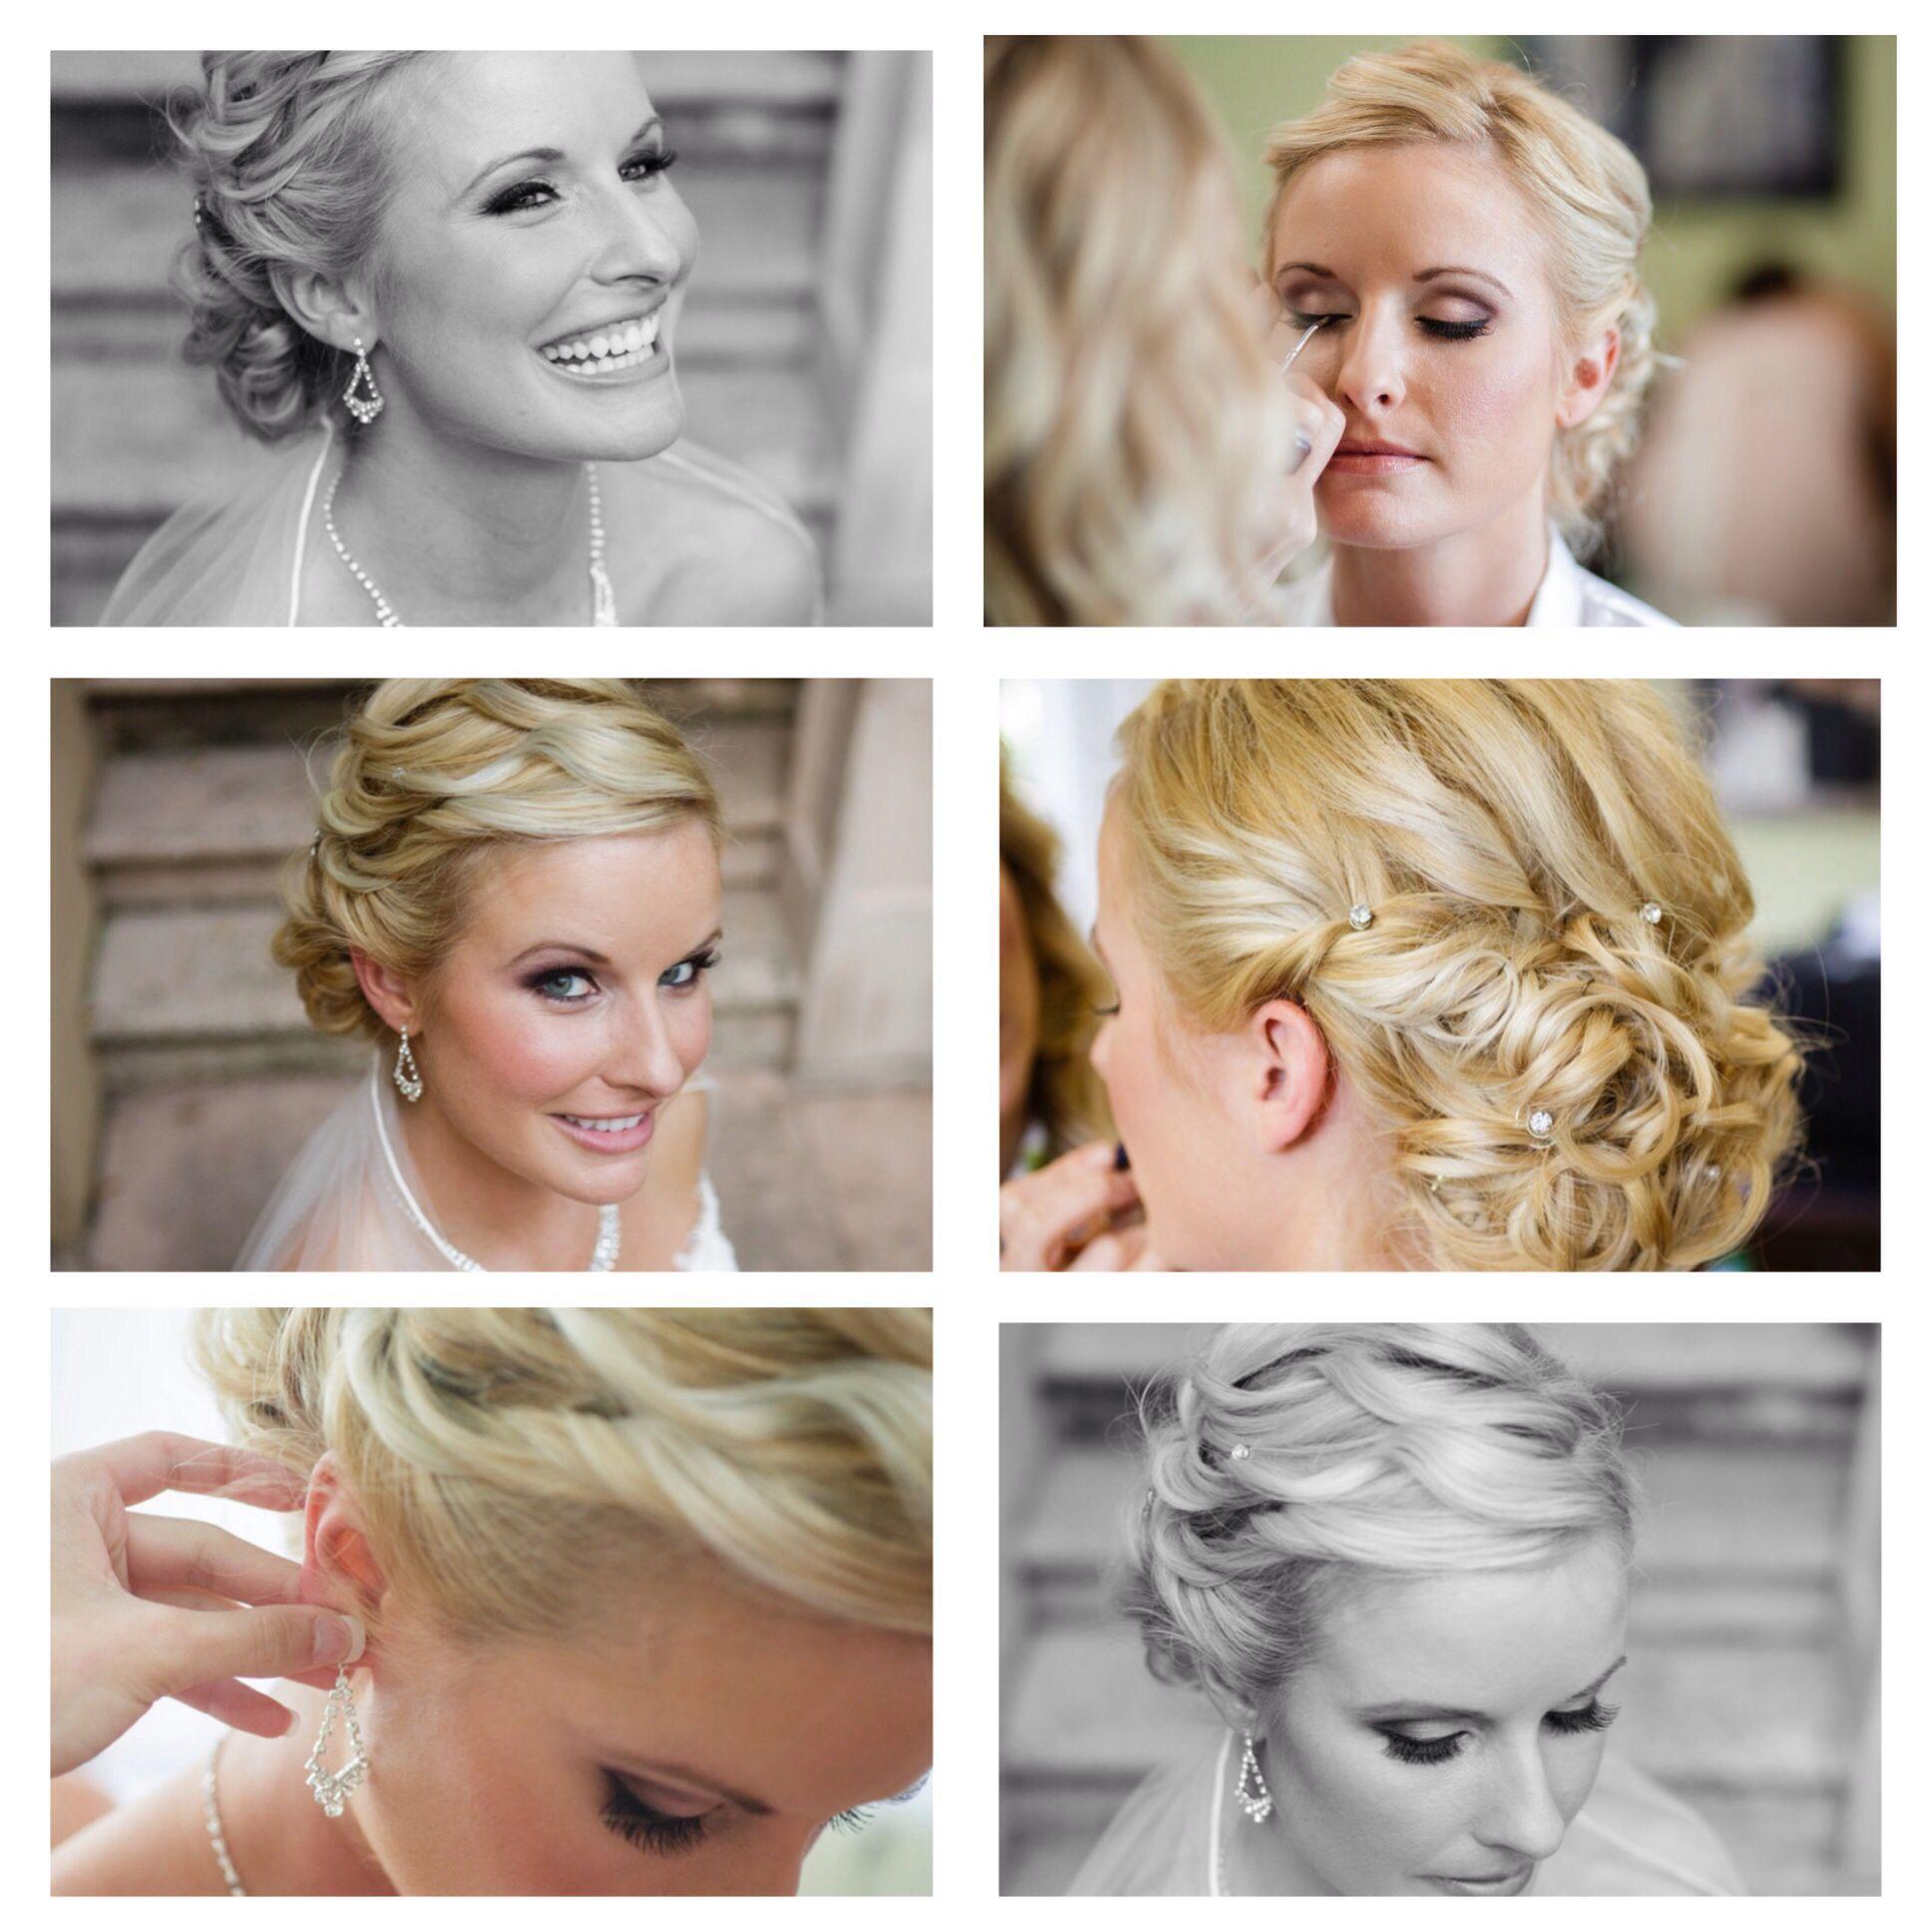 Wedding hair and makeup! Thank you to my fabulous artists!! Hair Melissa Edwards- Aura Salon, Makeup - Lucia Palenik -Fam Well Clinic North FL OBGYN :)